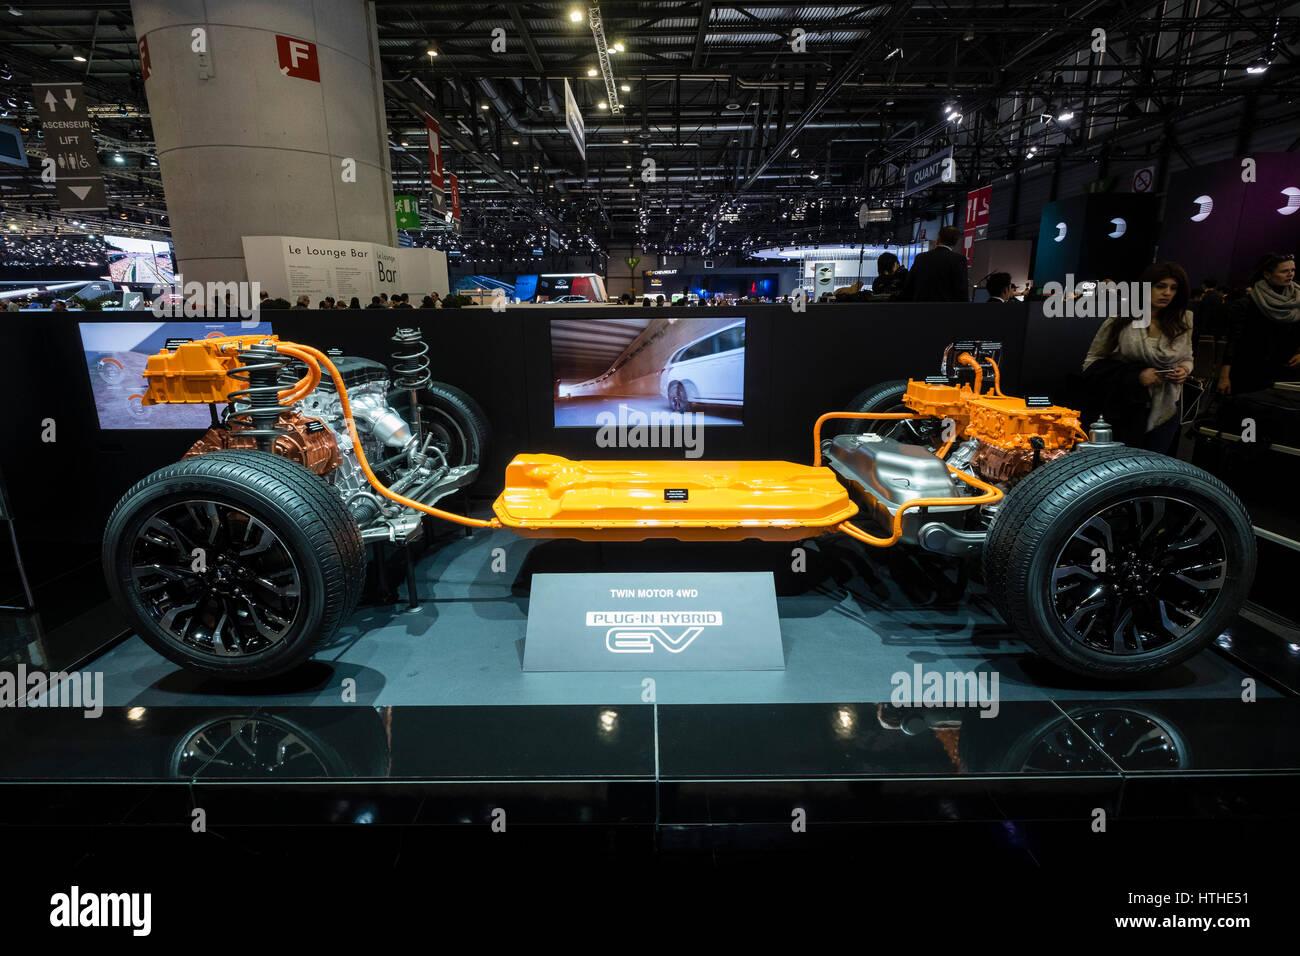 Mitsubishi EV hybrid powertrain elettrico sul display a 87th Geneva International Motor Show di Ginevra Svizzera Immagini Stock